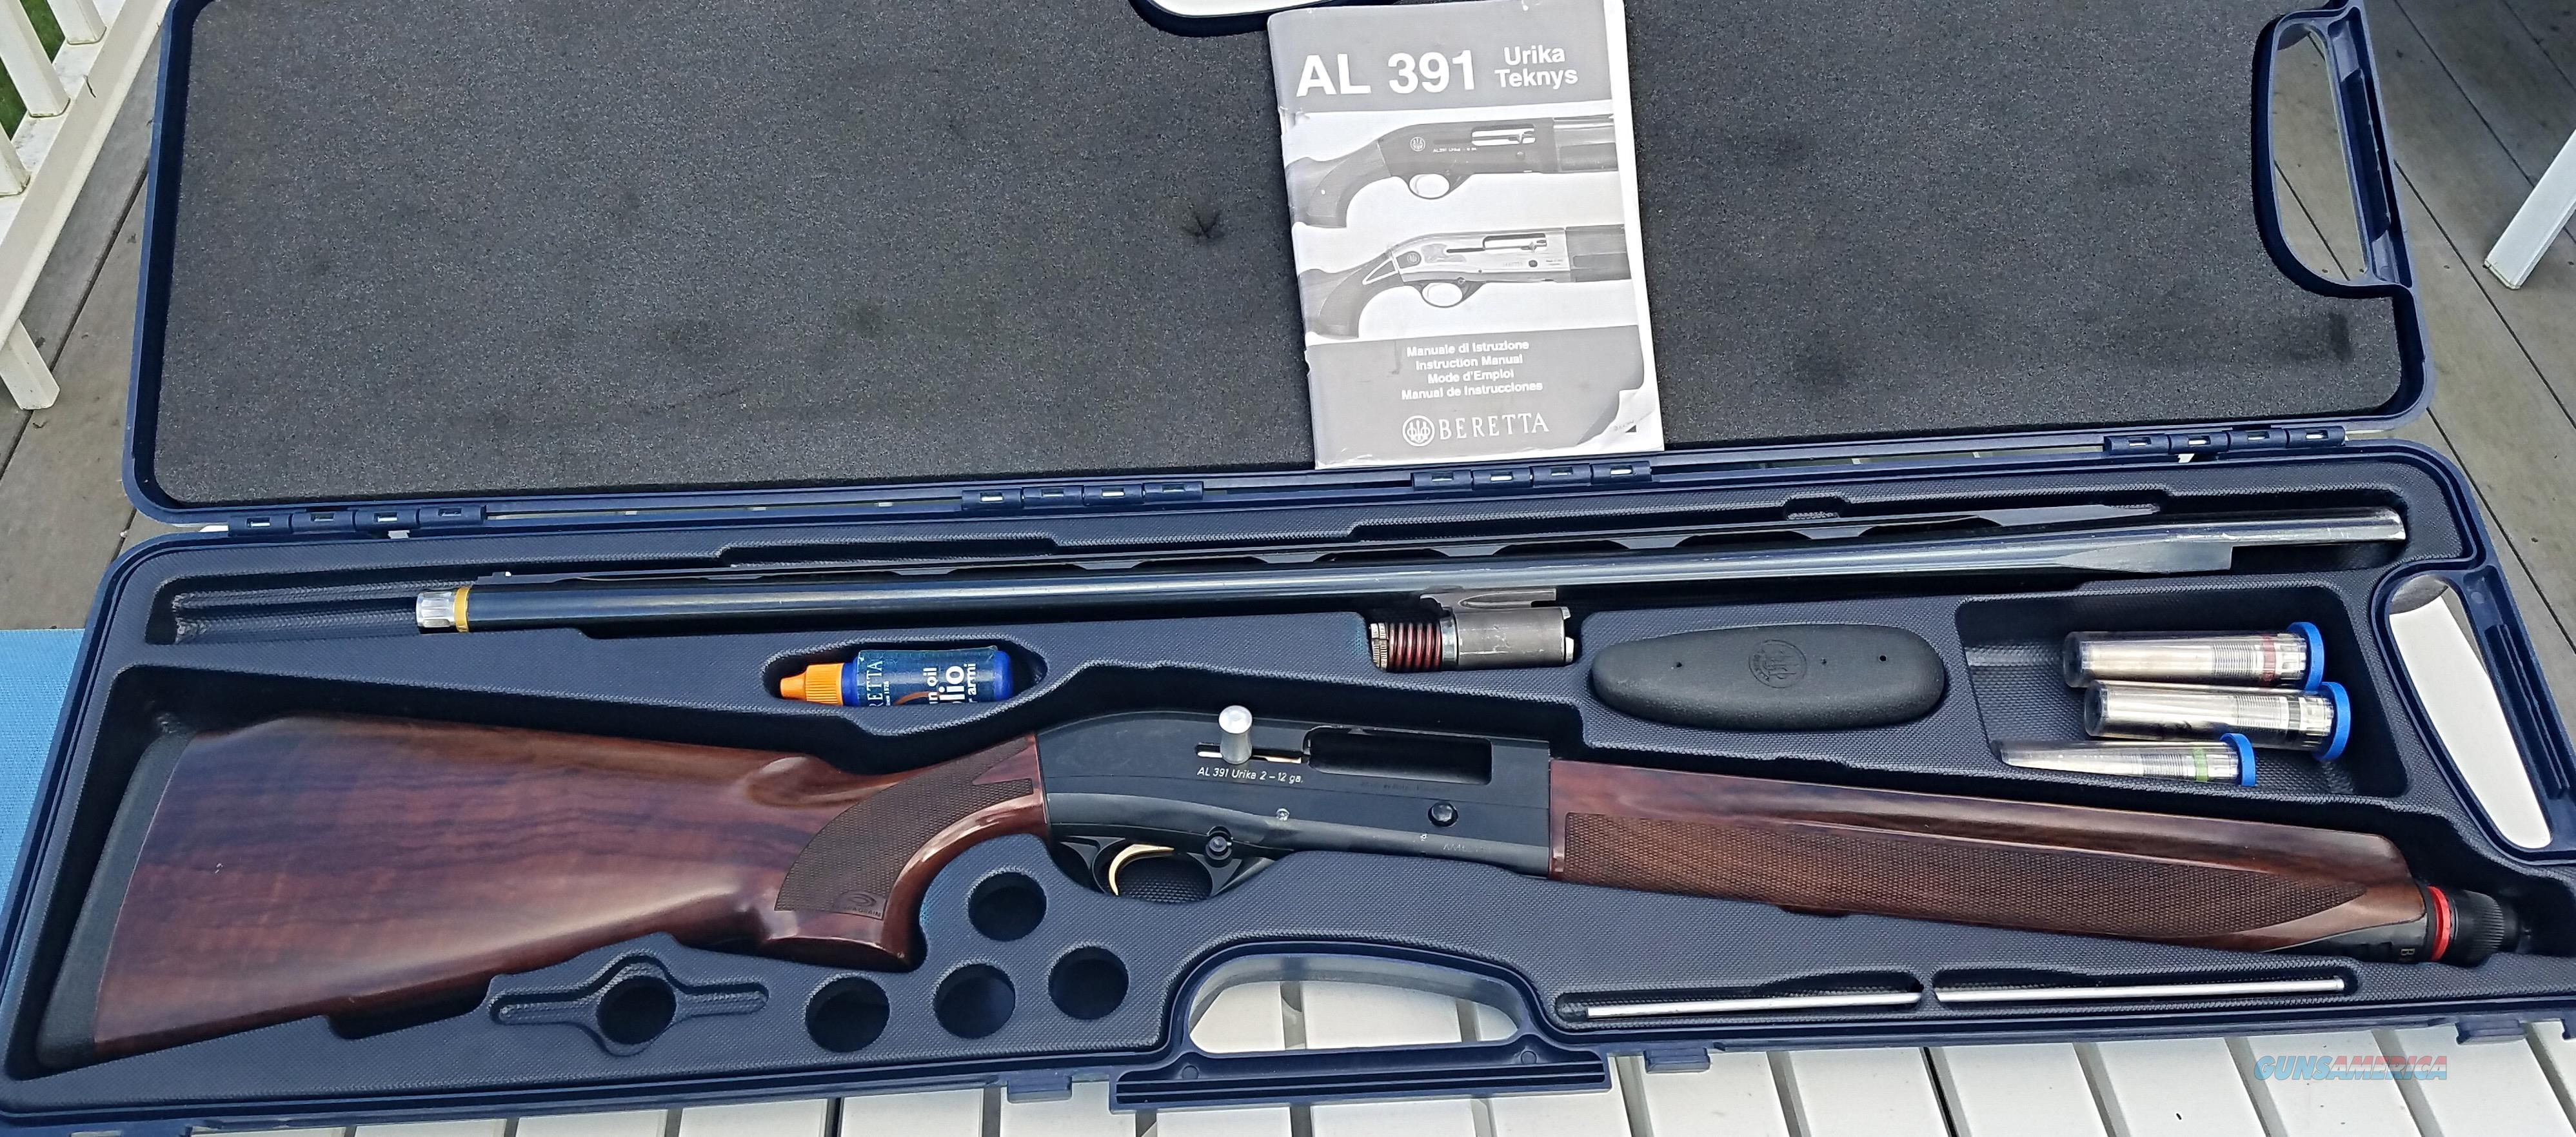 Beretta 391 Urika 2 Paralell Comb 12 ga